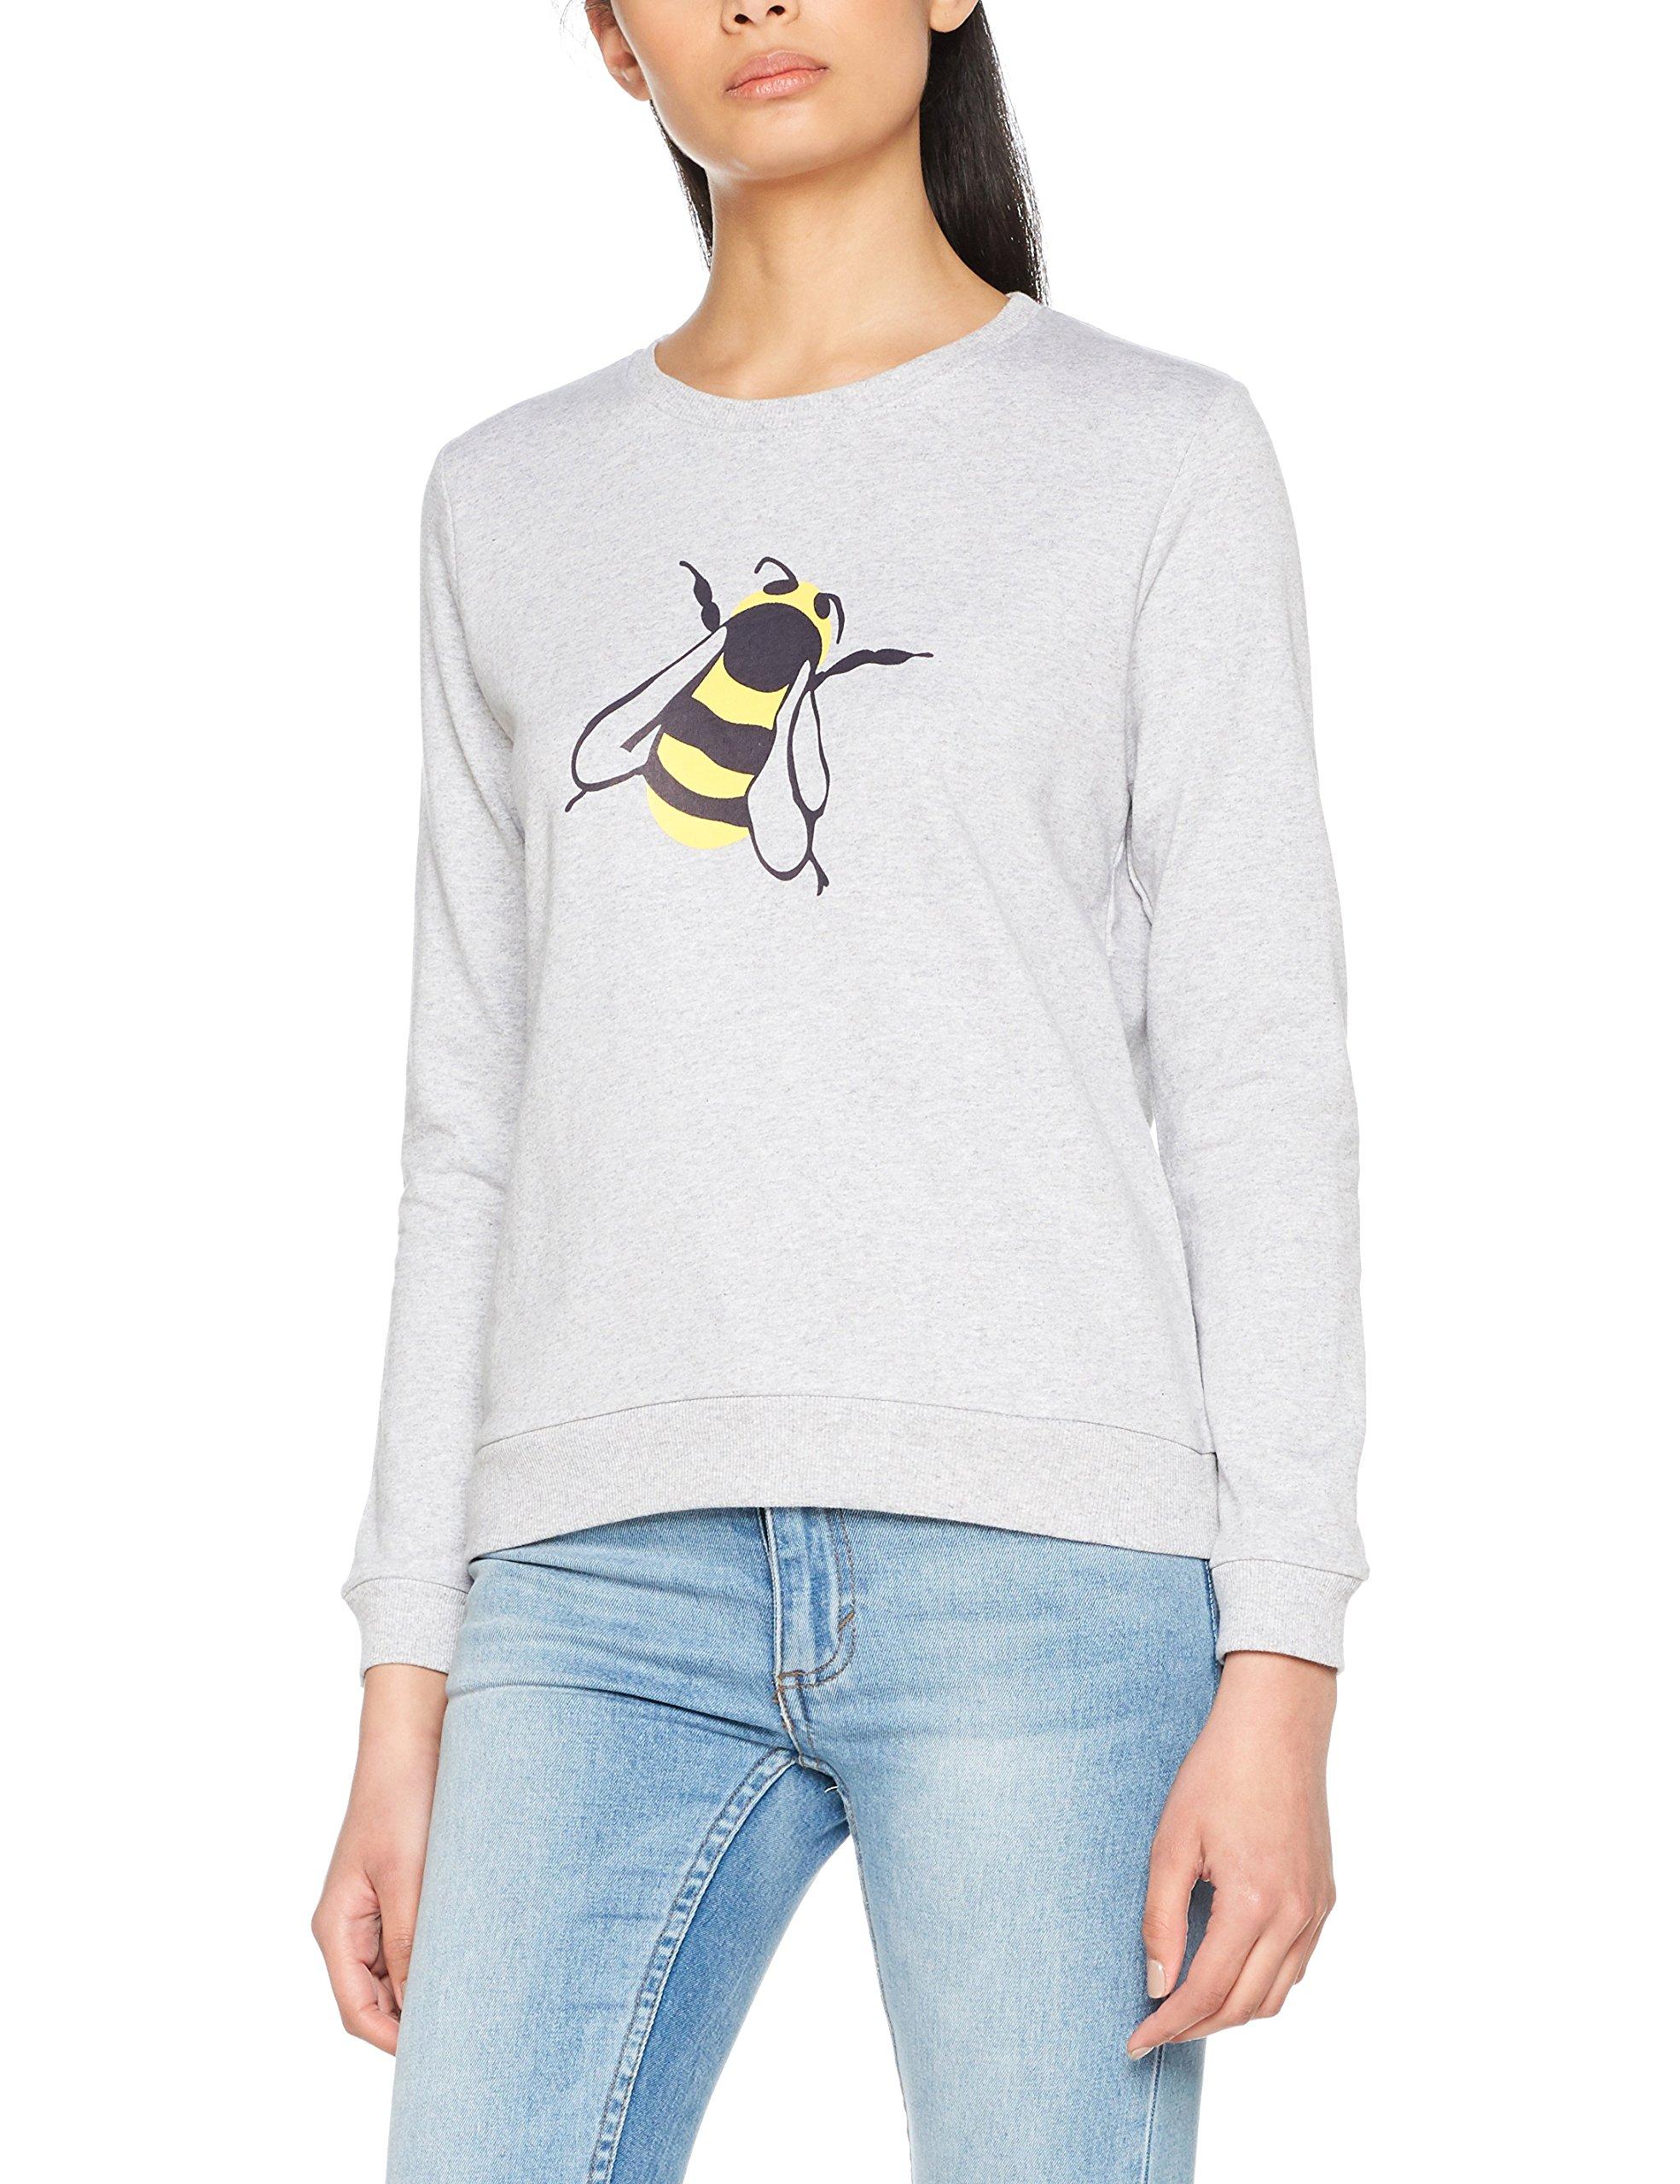 PullGrisgrey Tree 00140 Sweatshirt Bee Femme People DIEHY2W9